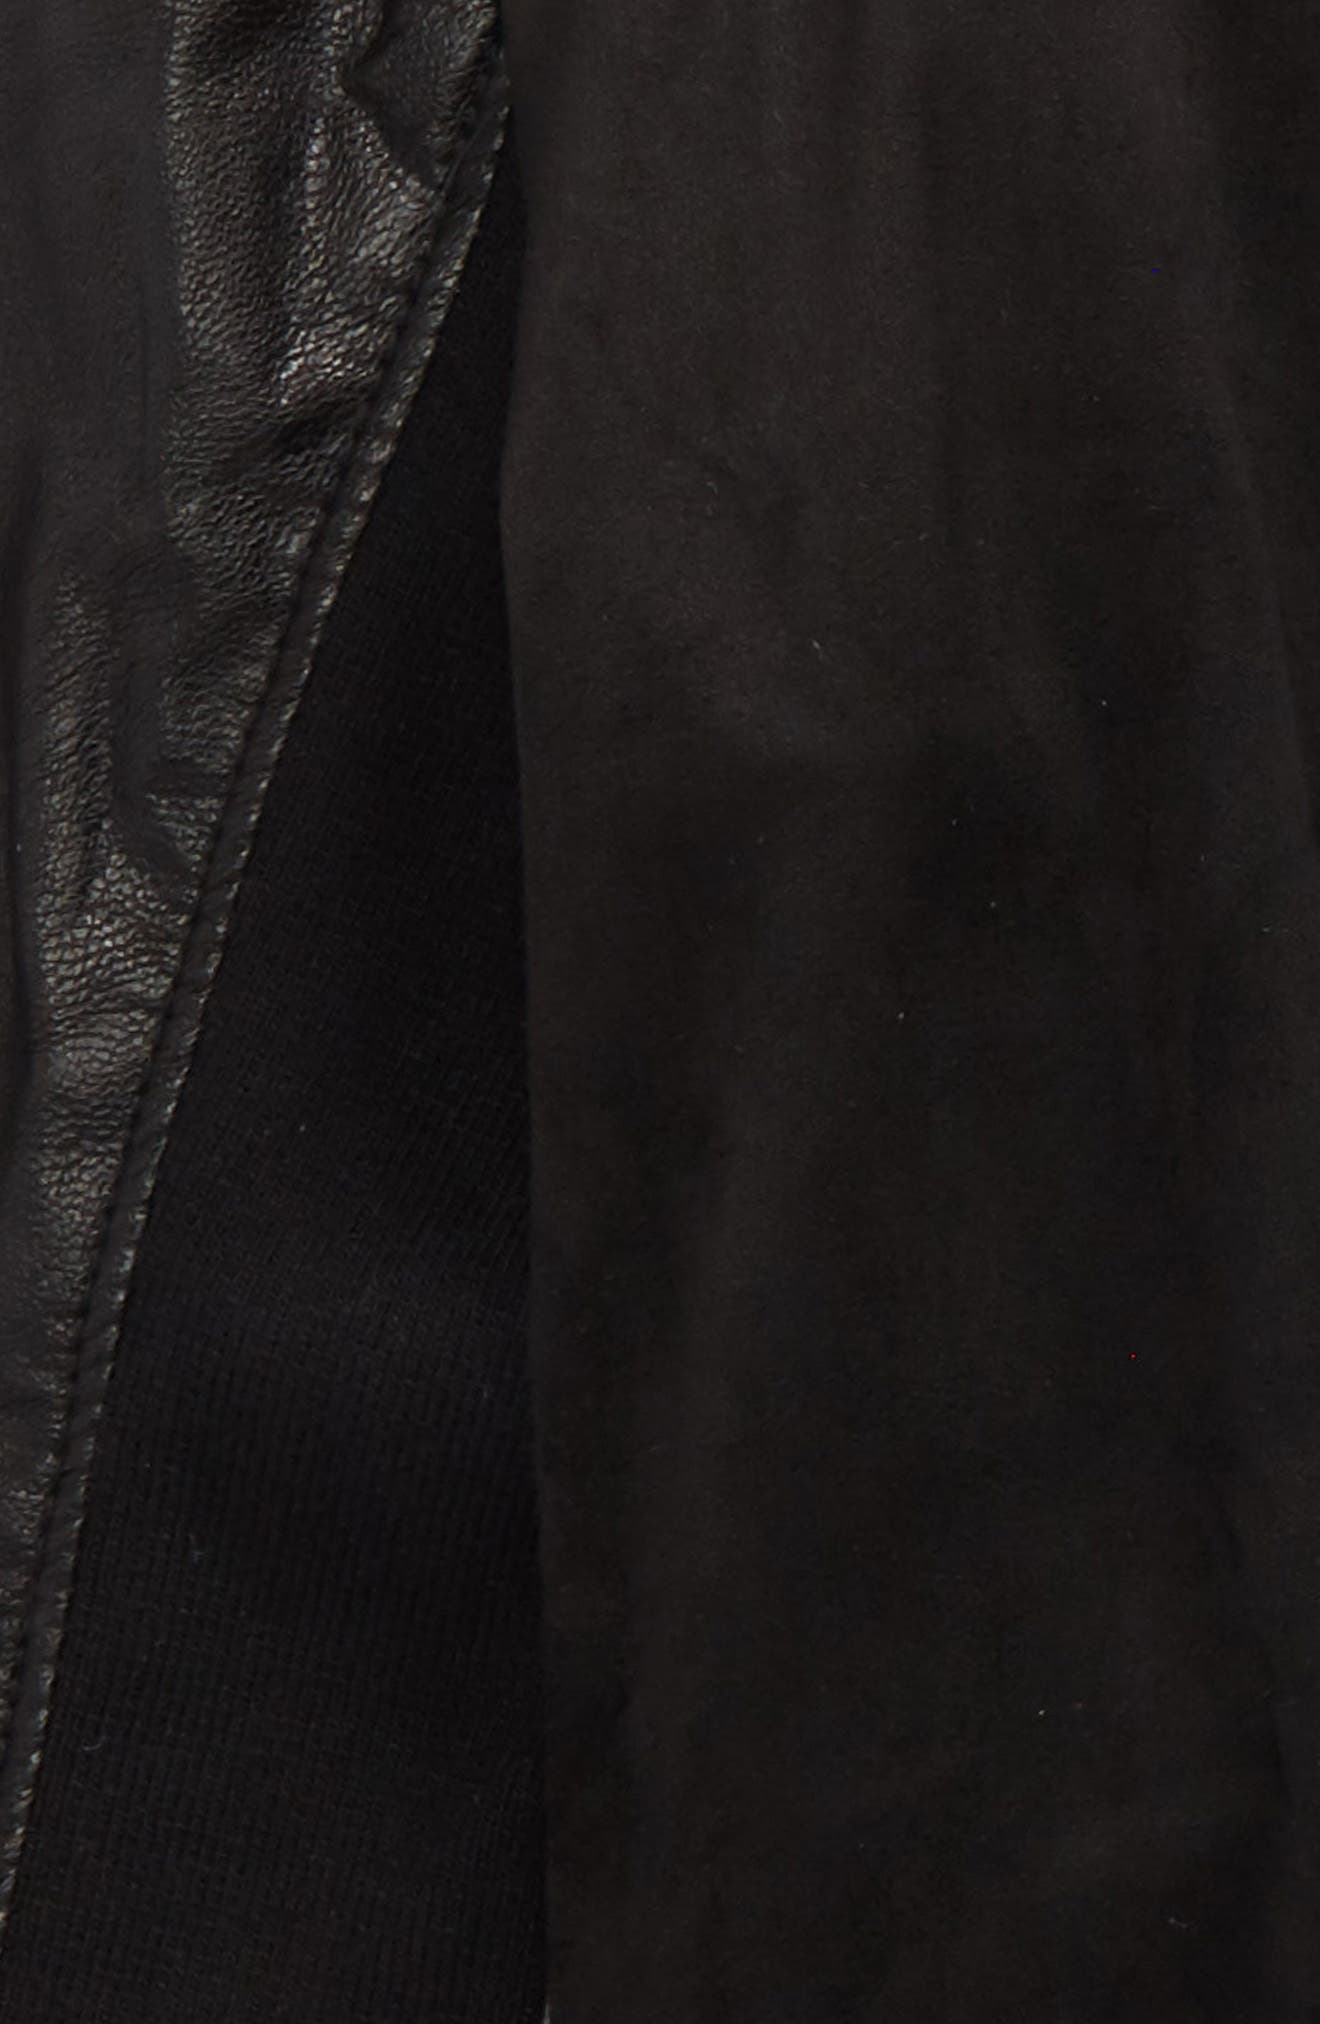 Asymmetrical Faux Leather Jacket,                             Alternate thumbnail 2, color,                             Black